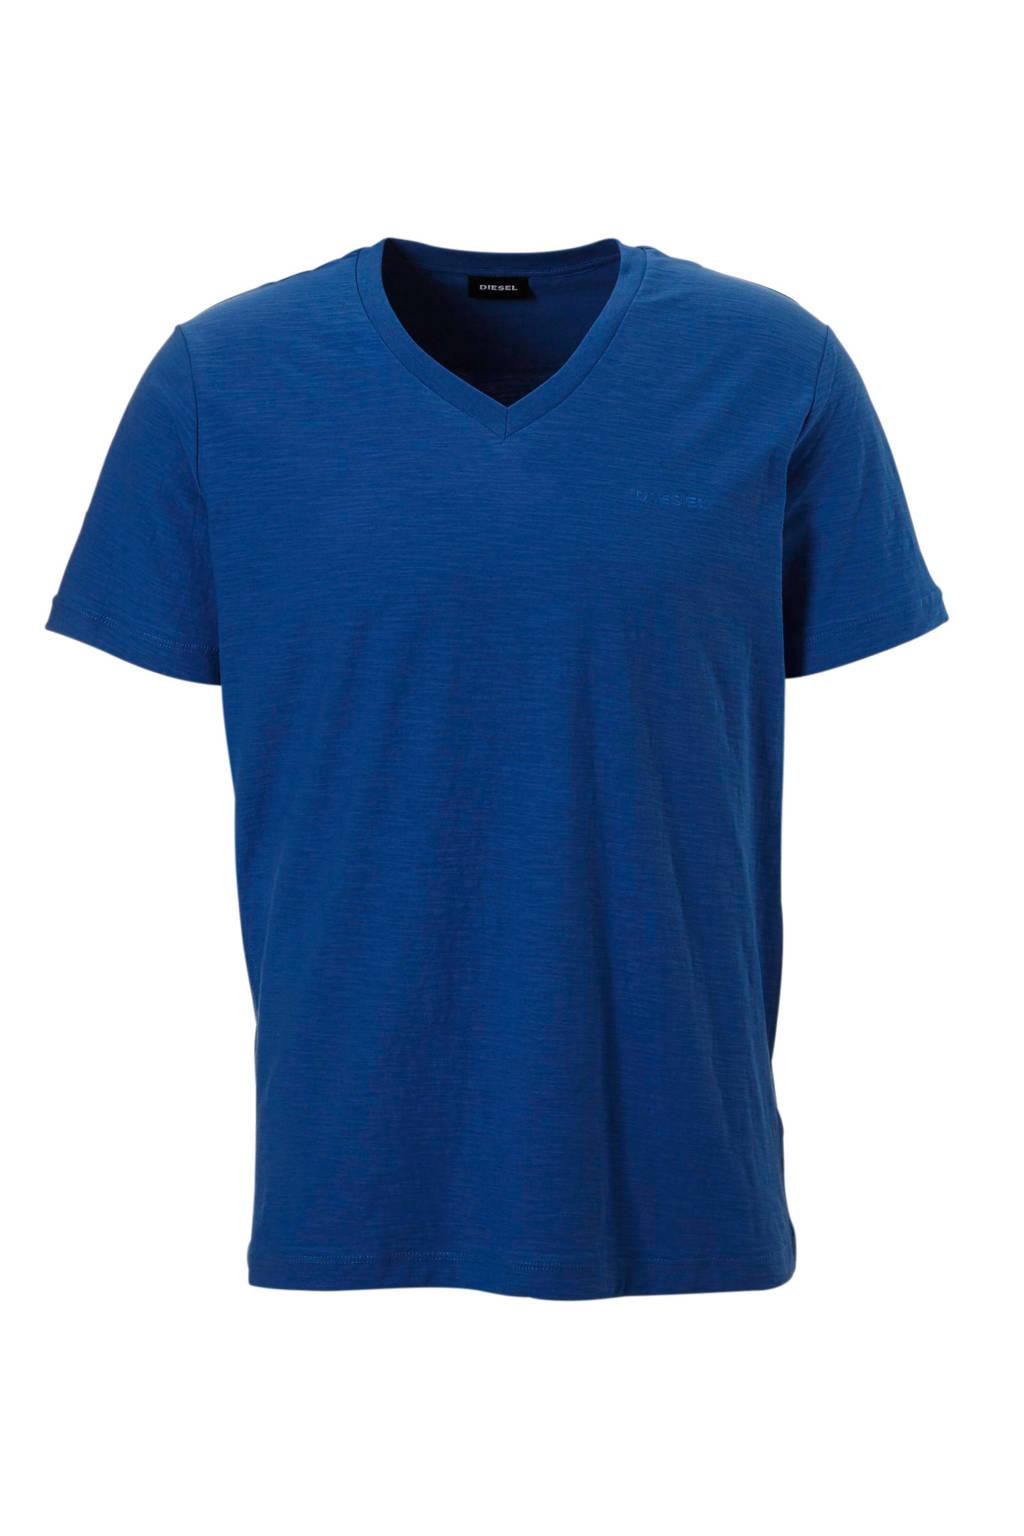 Diesel T-shirt, Kobalt